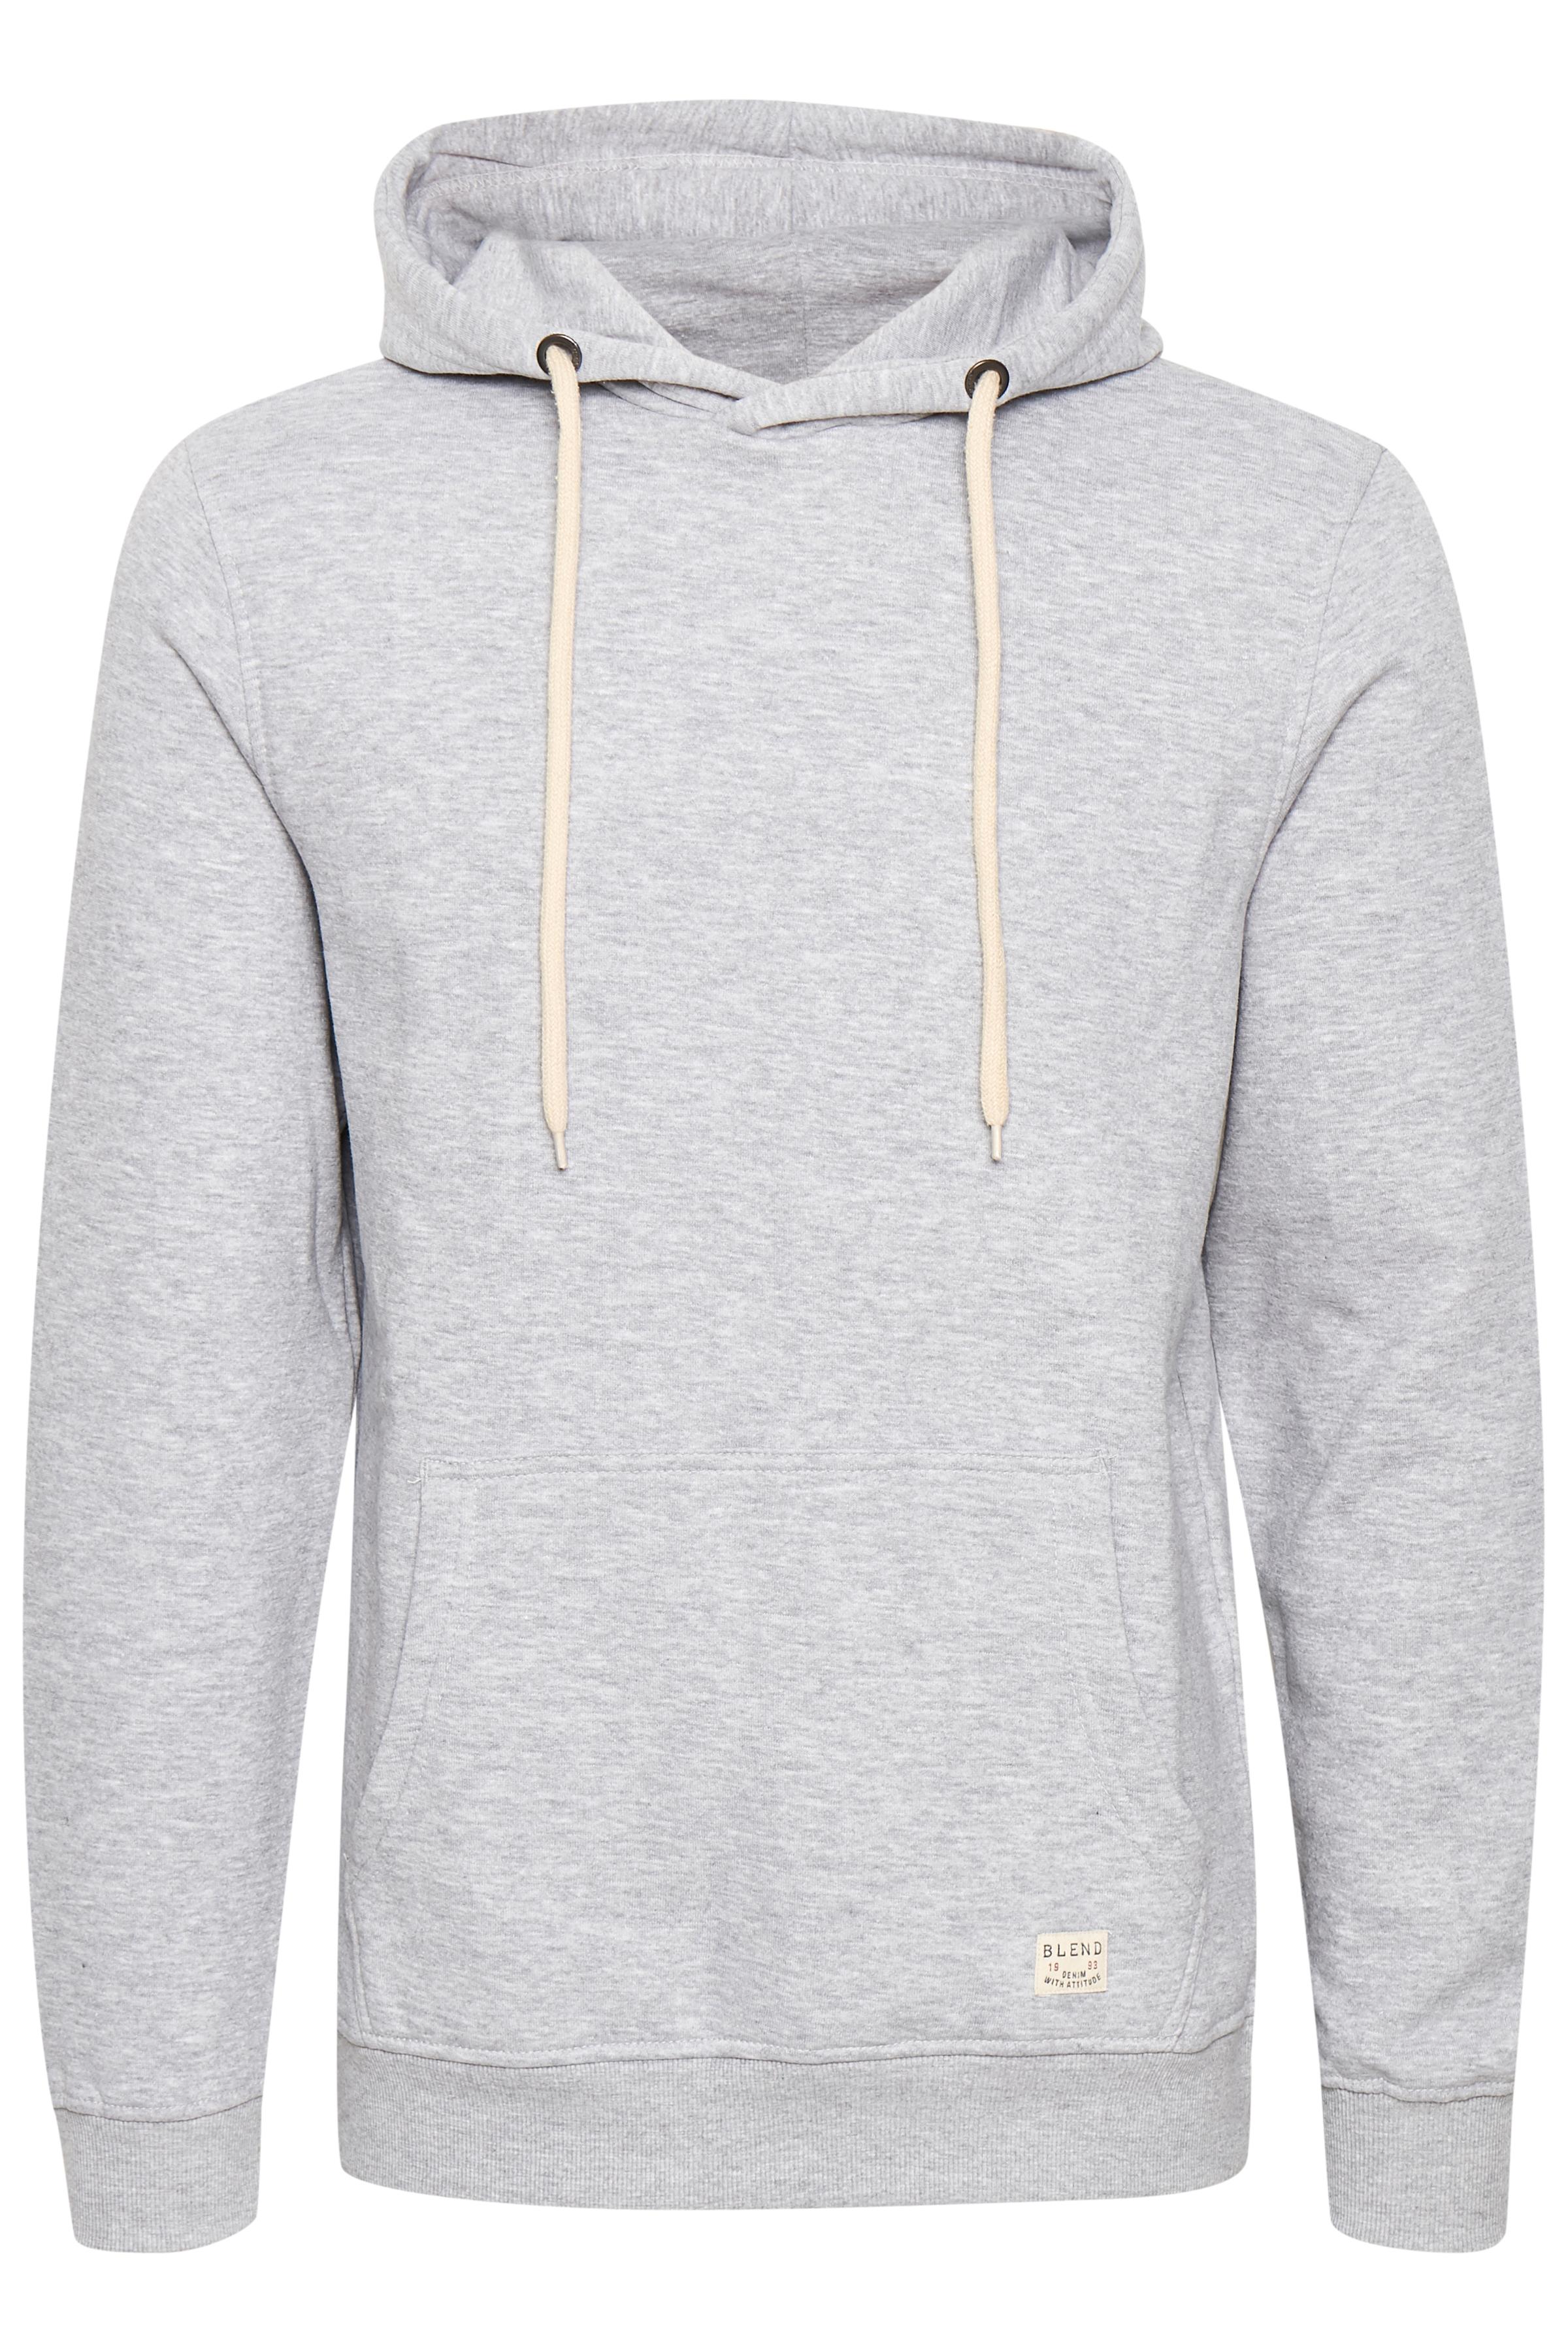 Blend He Herre Langærmet sweatshirt - Gråmeleret